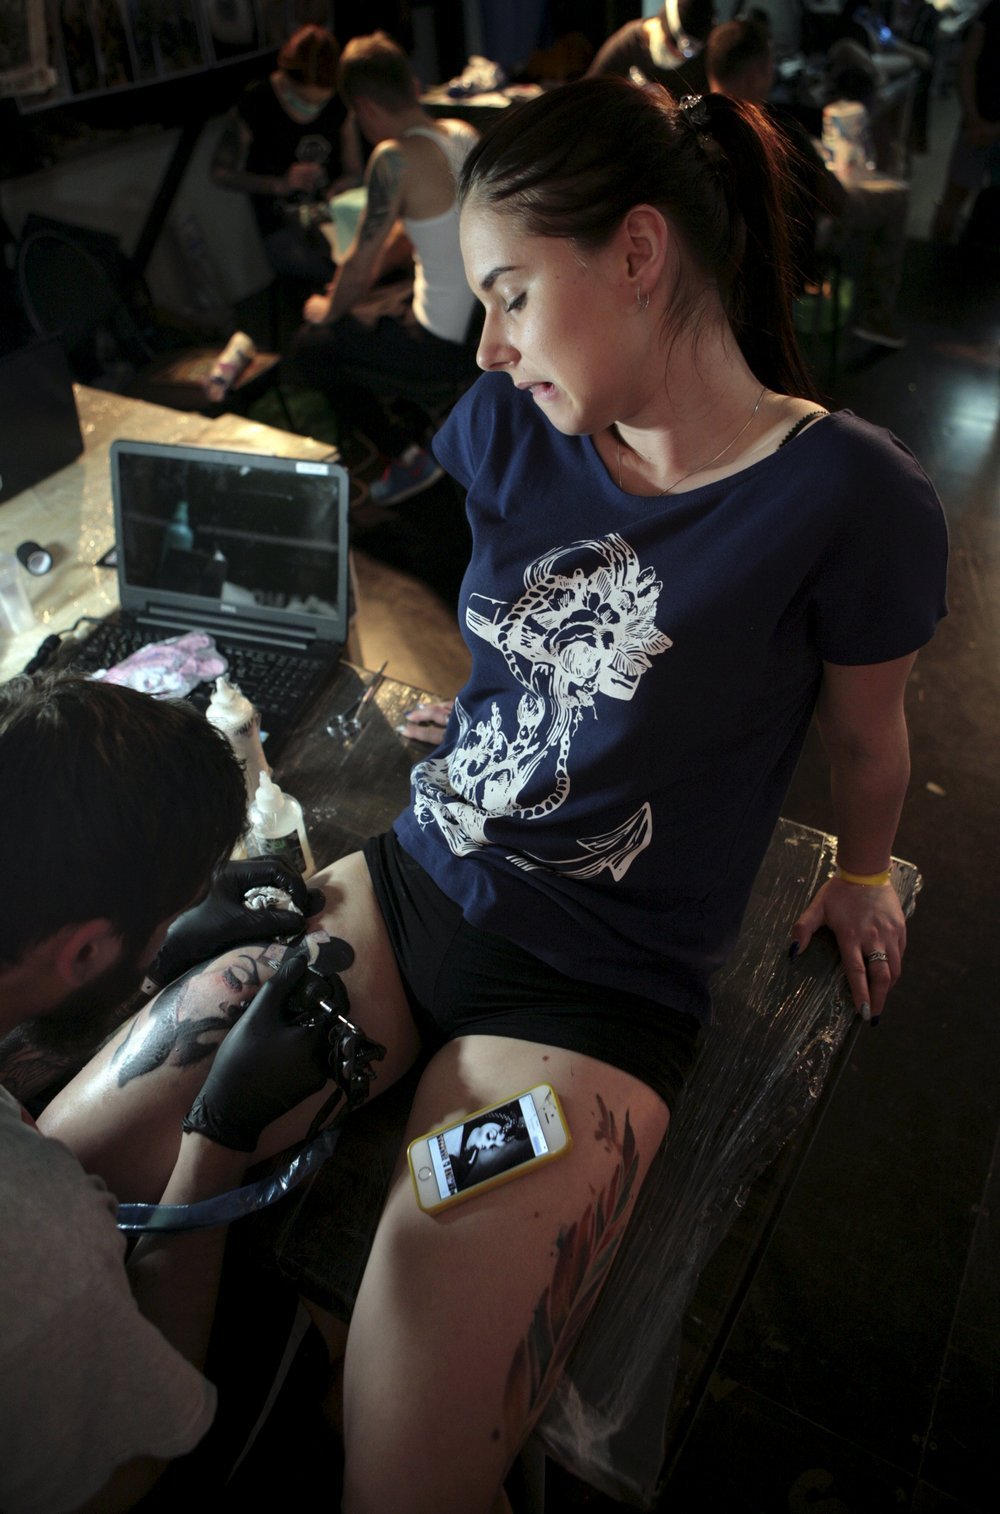 Artist works on tattoo on woman during International Tattoo Festival in Sochi